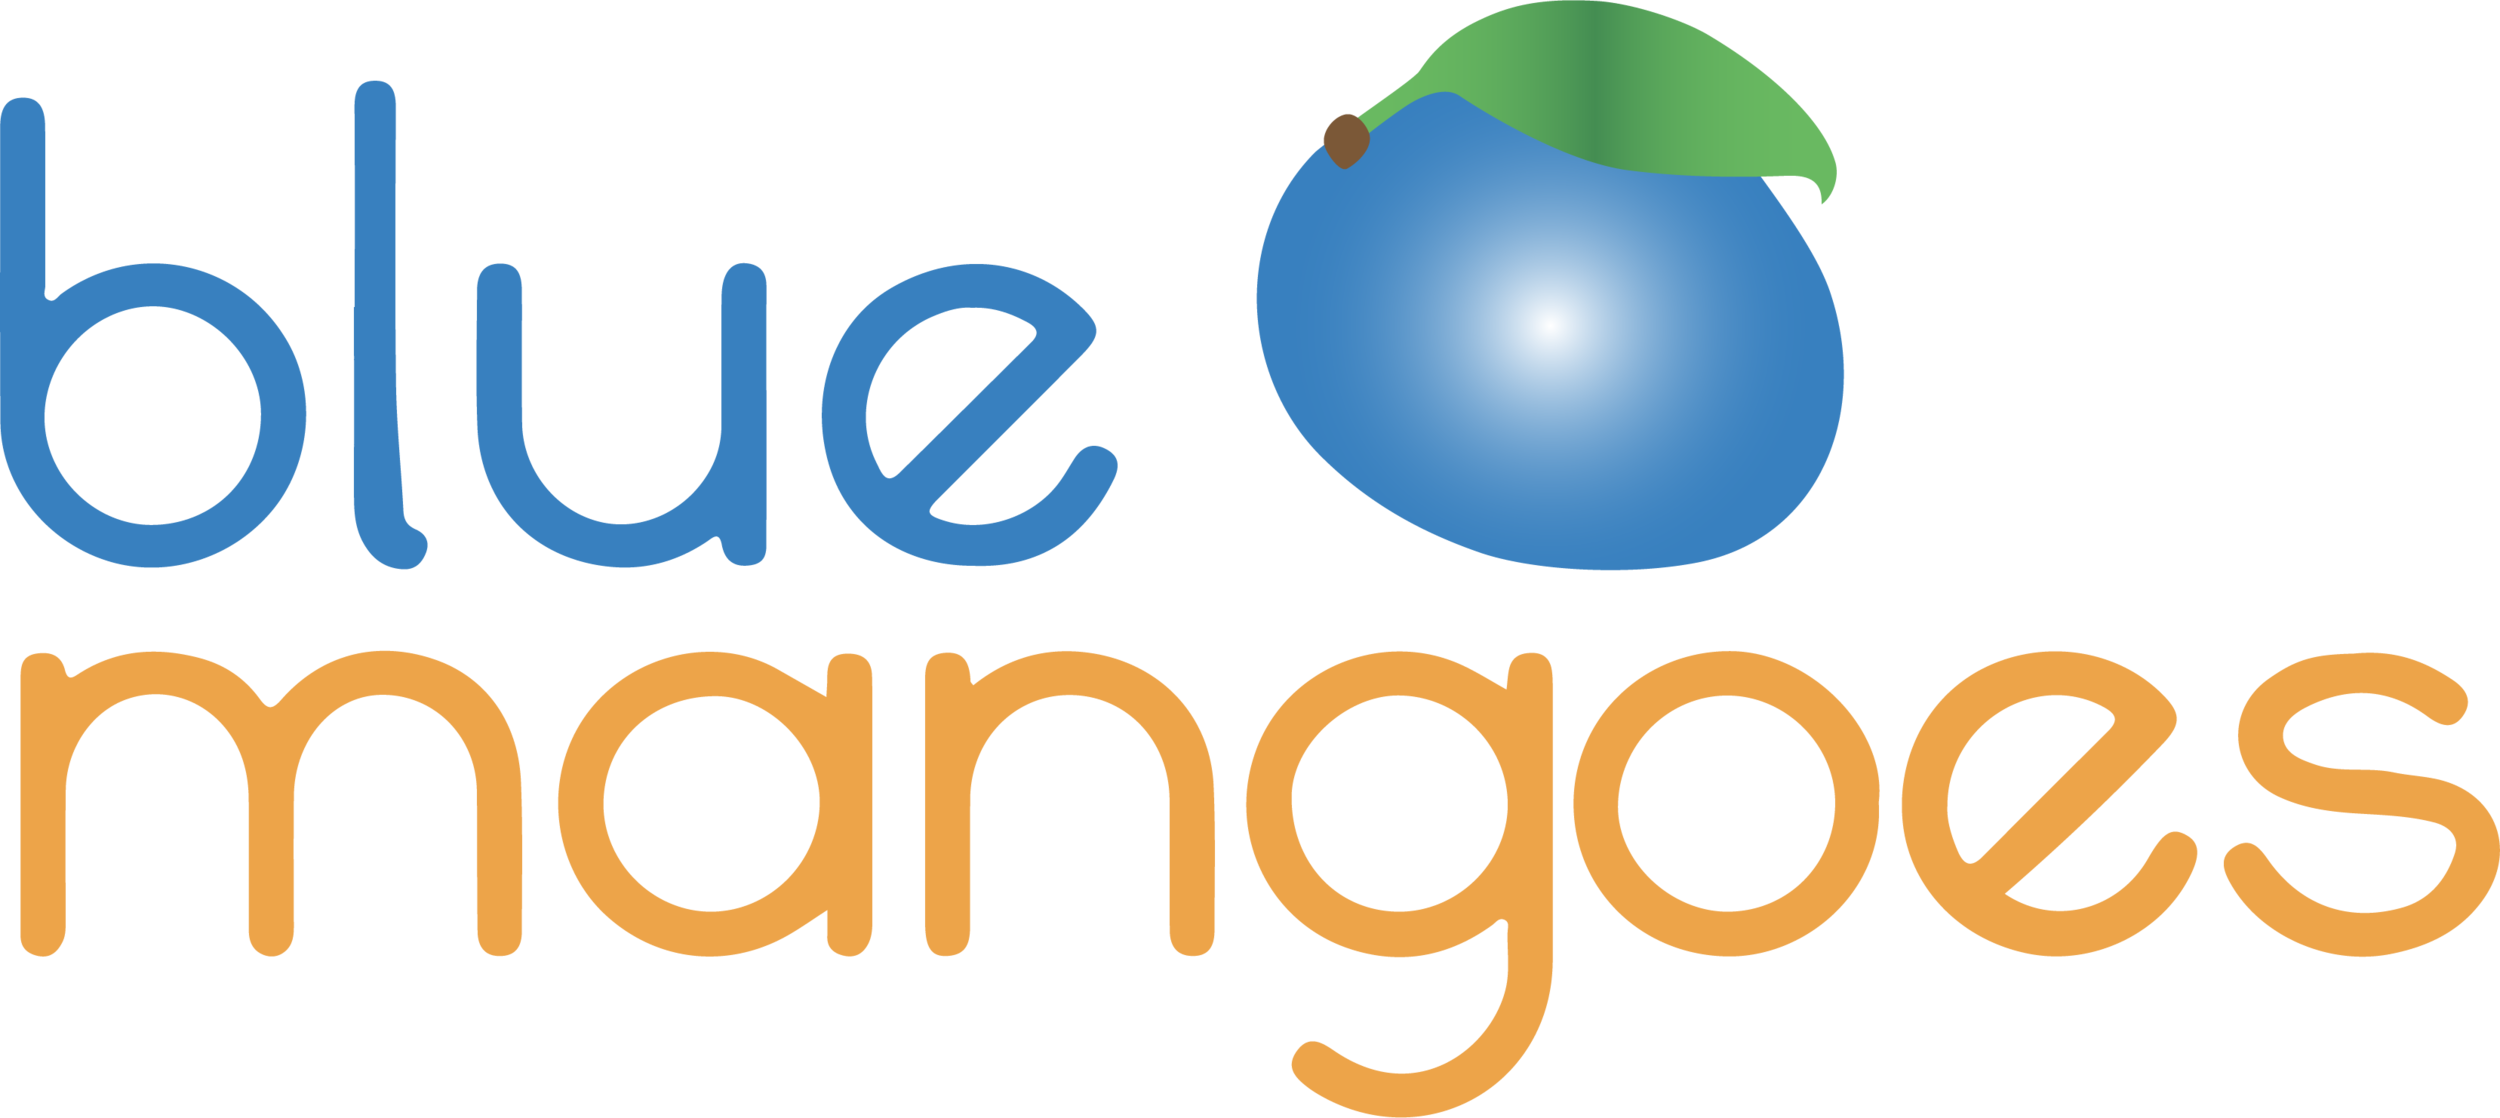 Blue Mangoes-full color (1).png